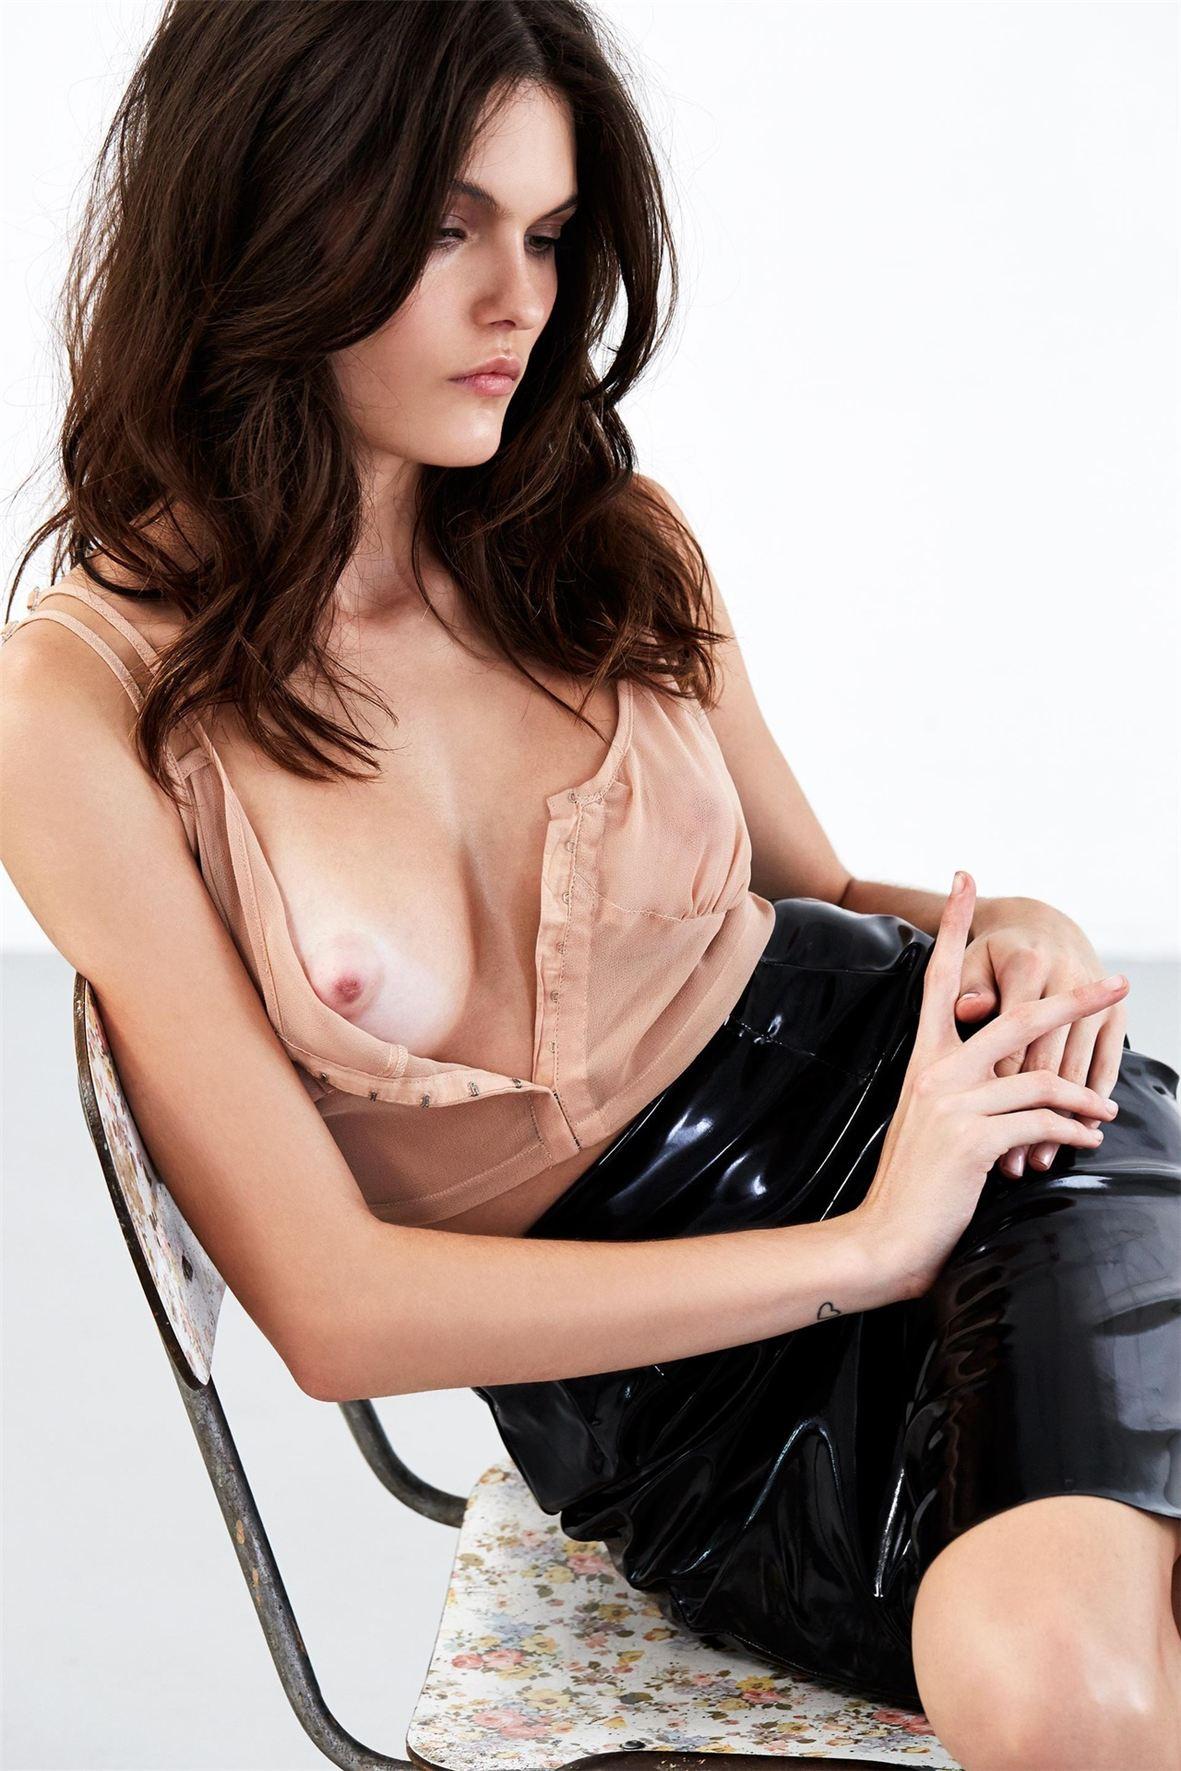 sexy Jovanka Novakovic nude by Jose Moraga